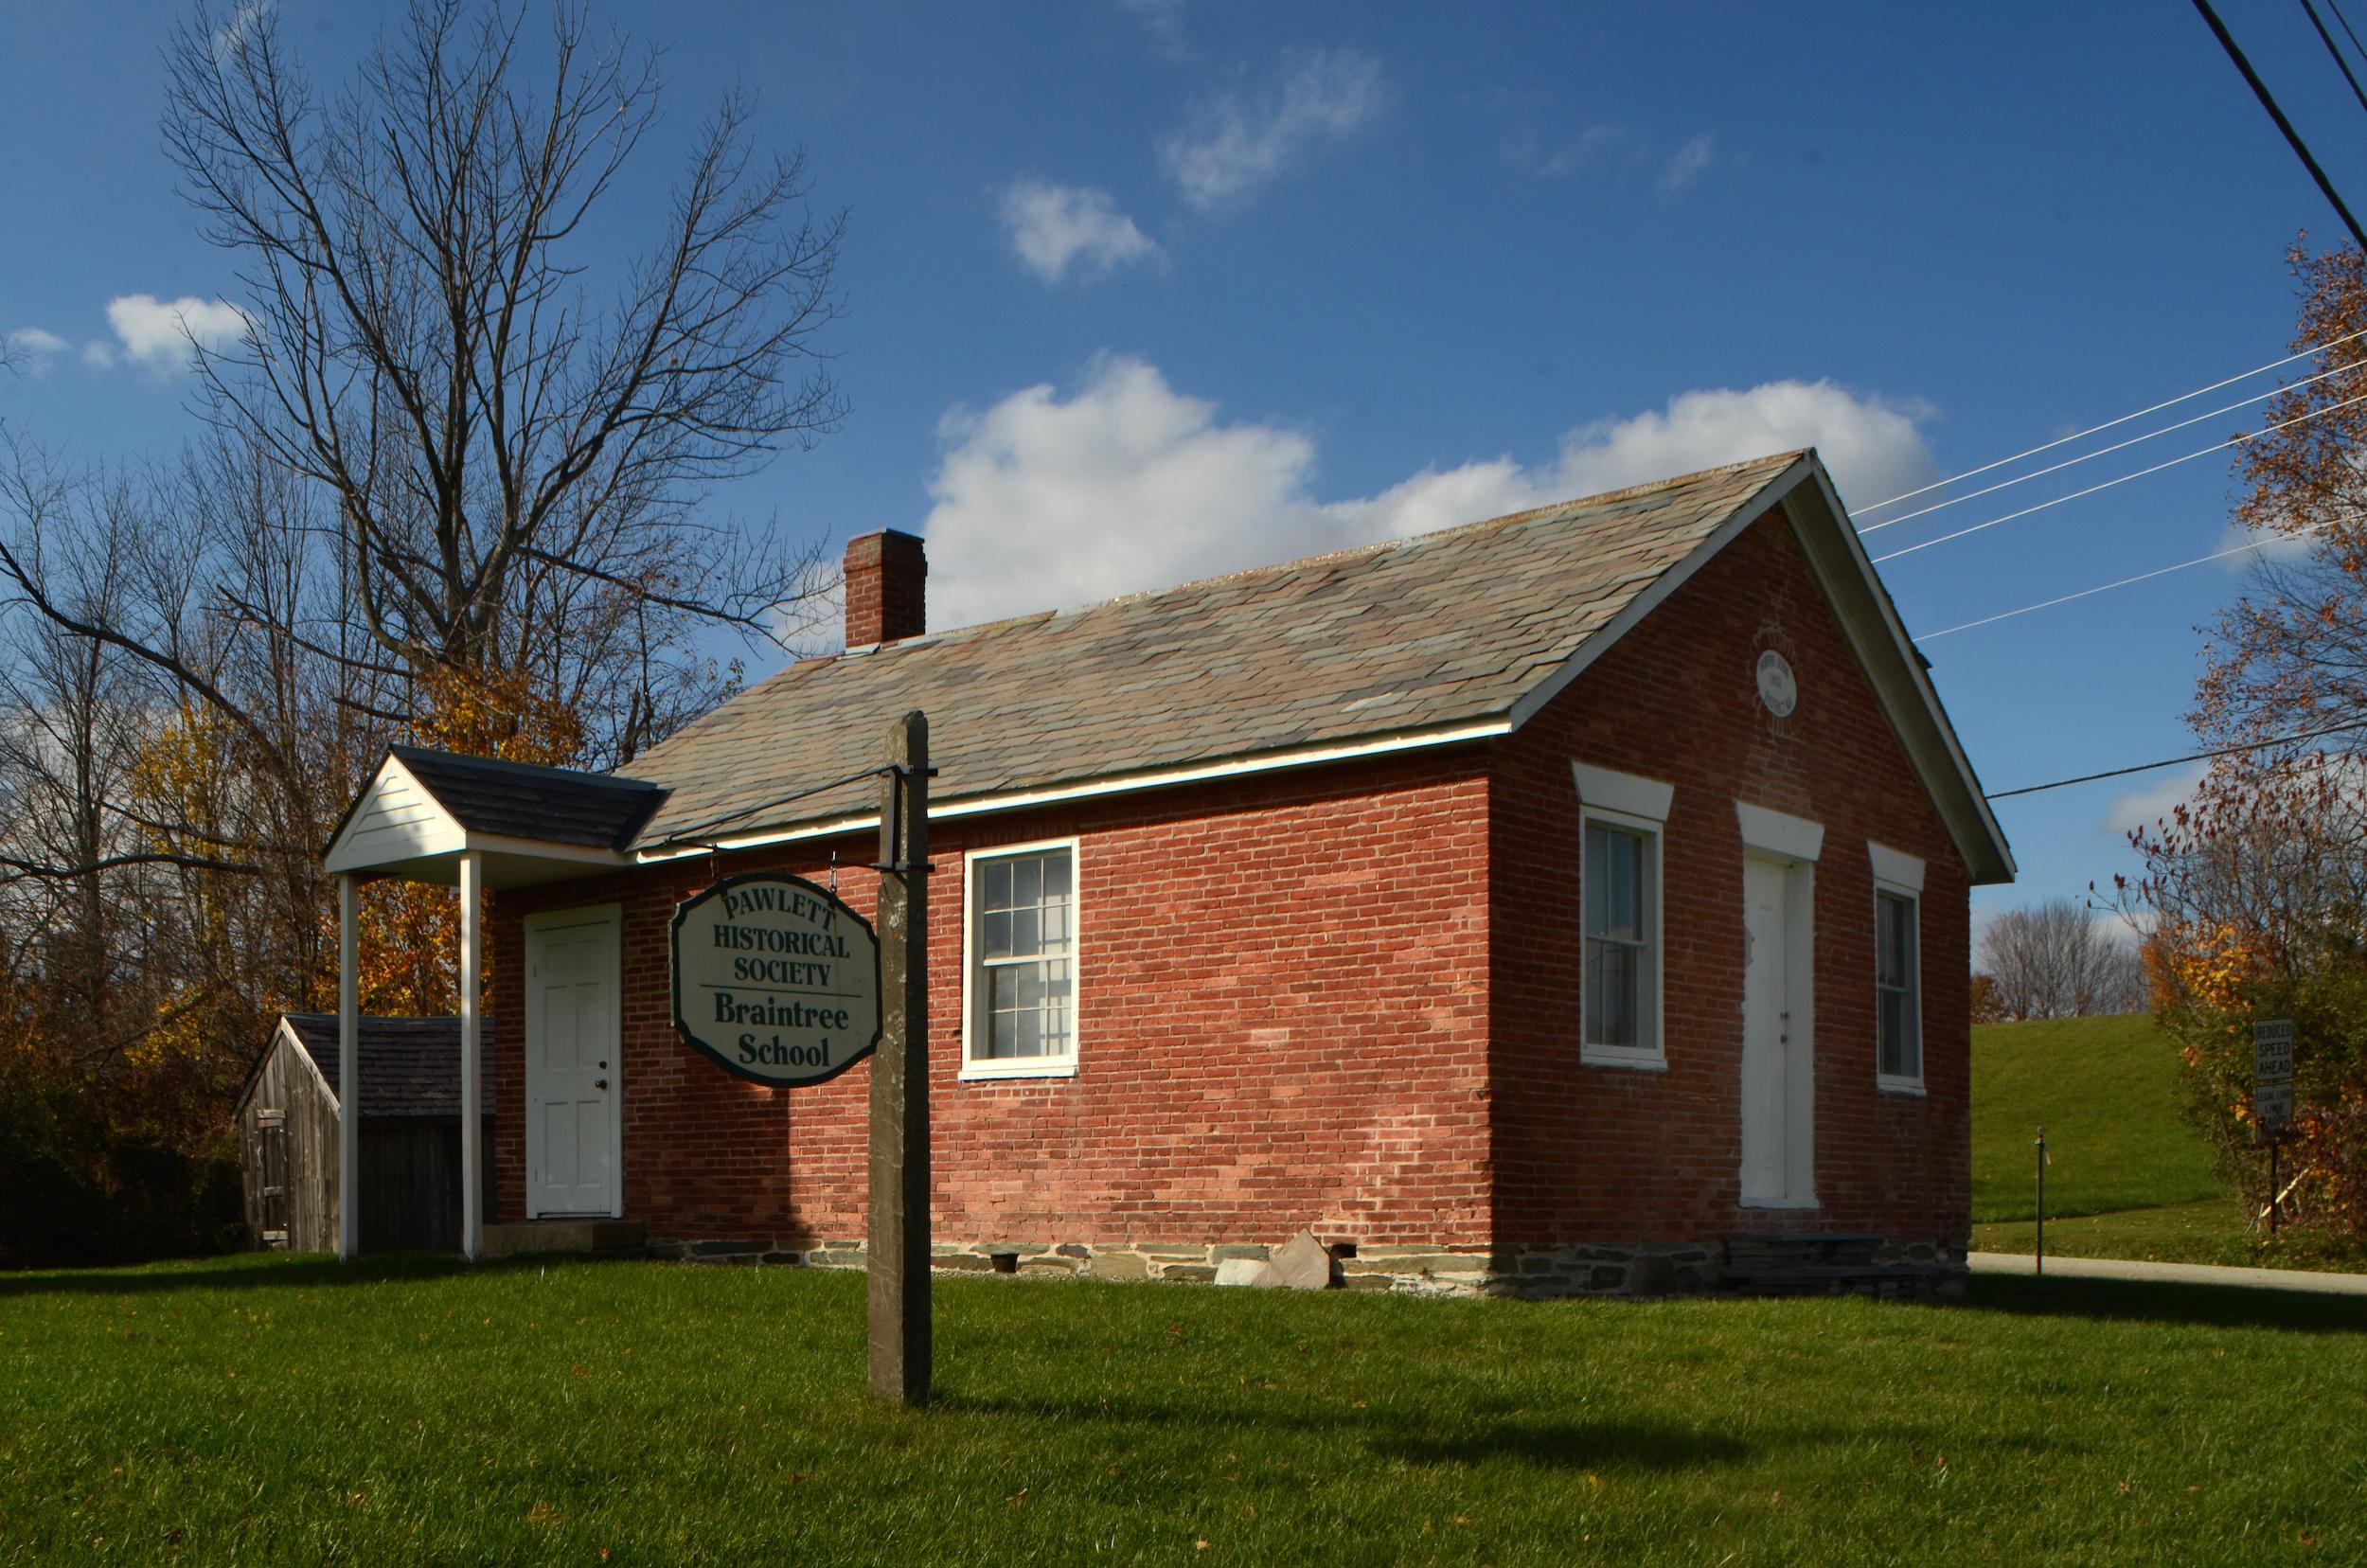 Pawlet Historical Society Braintree School